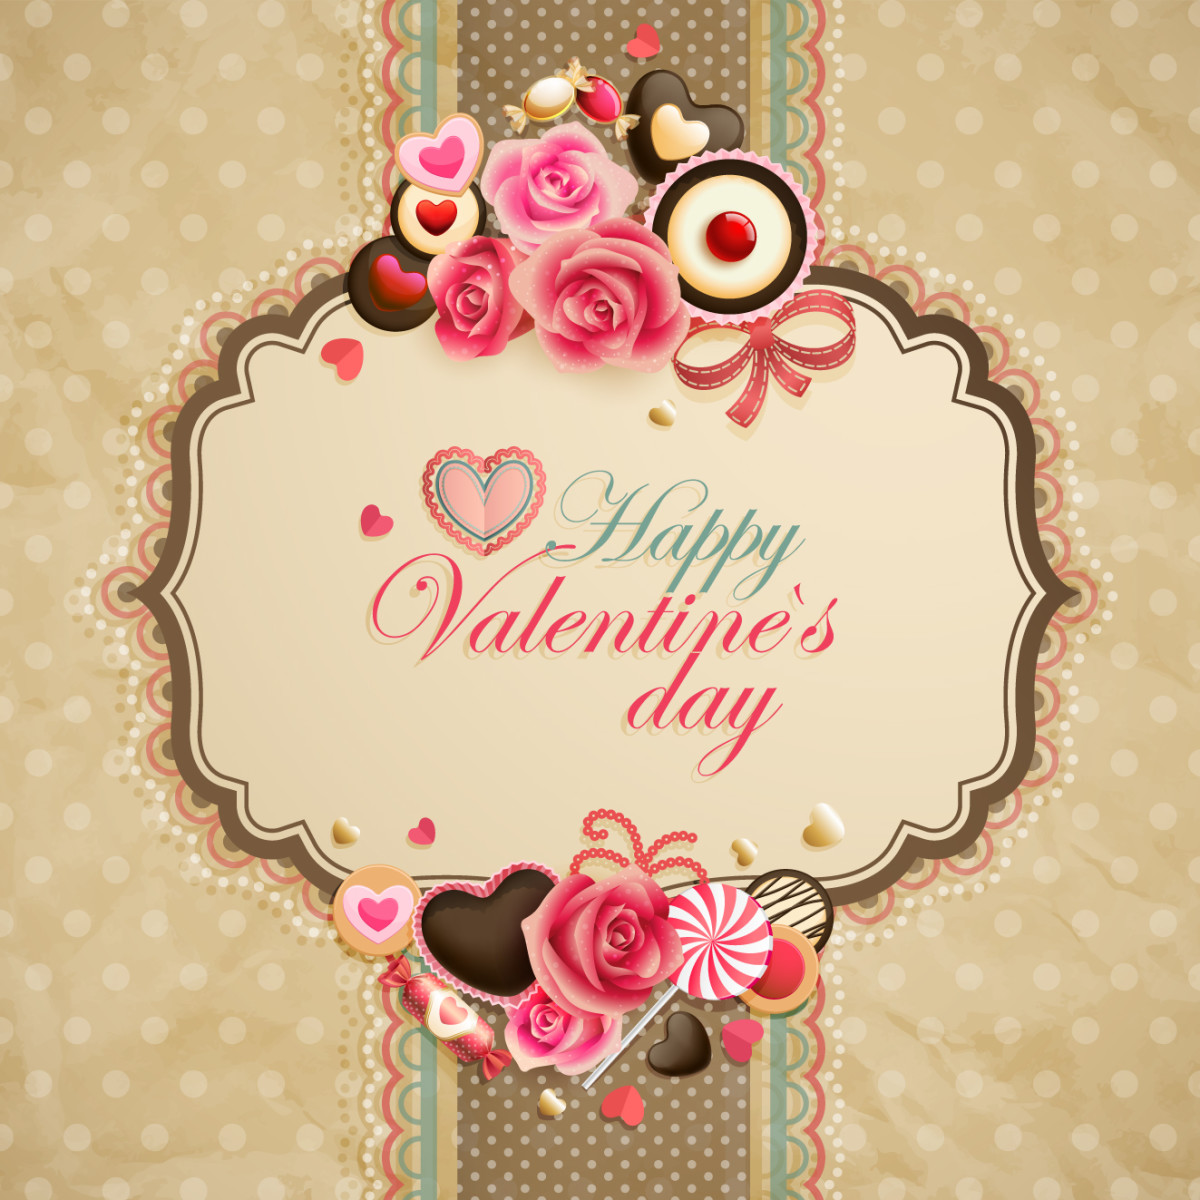 Happy Valentine's Day on a Ribbon